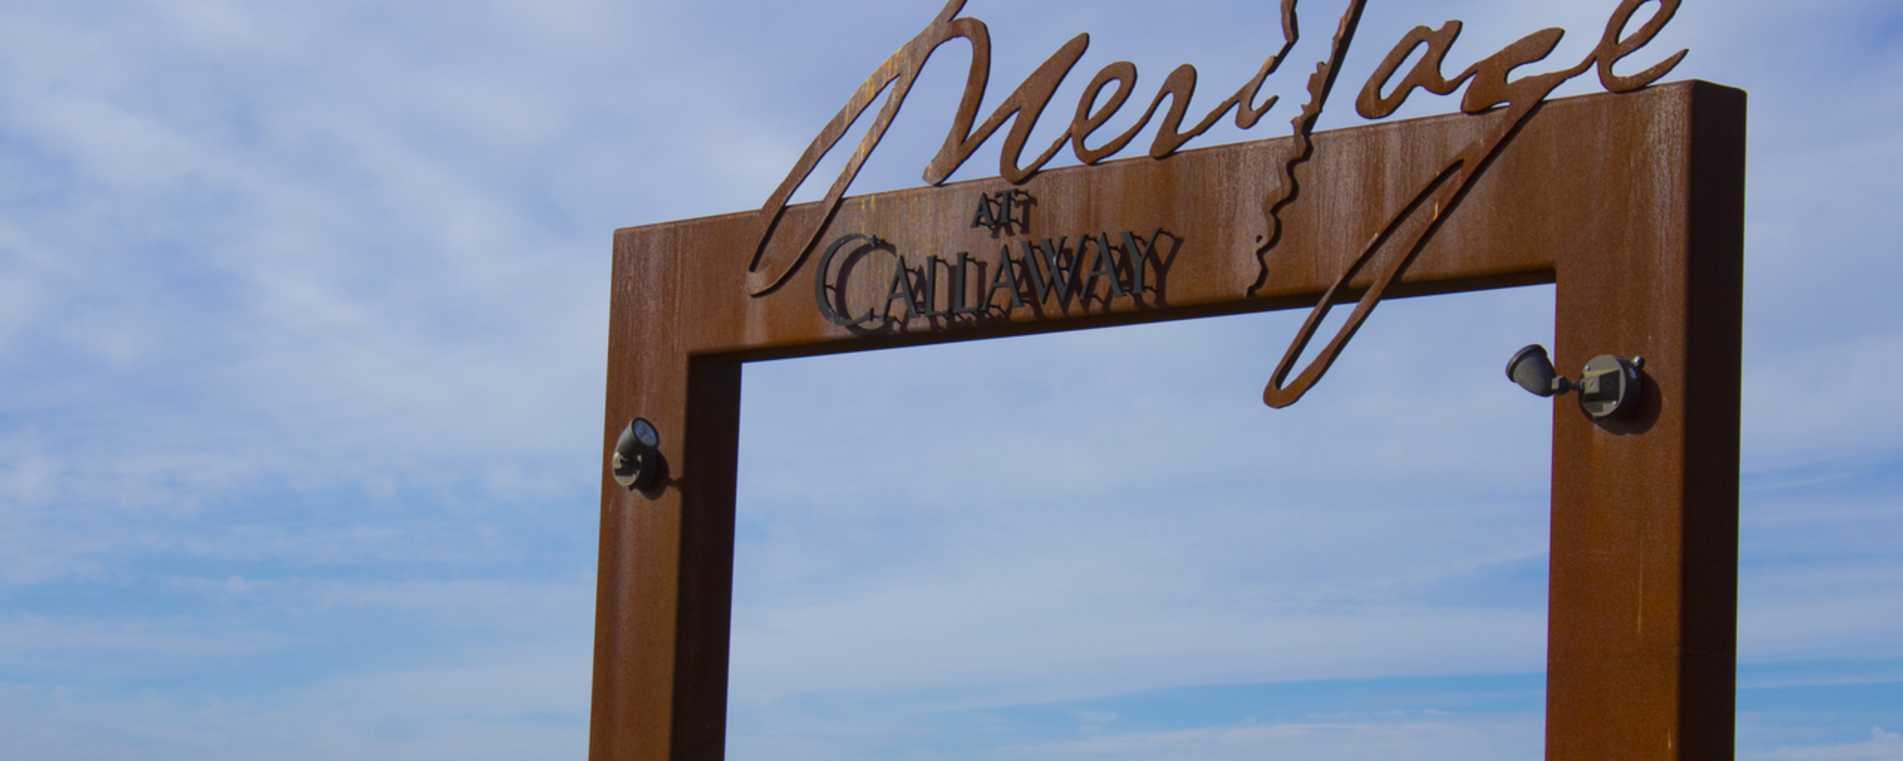 Meritage at Callaway Vineyard & Winery - Temecula